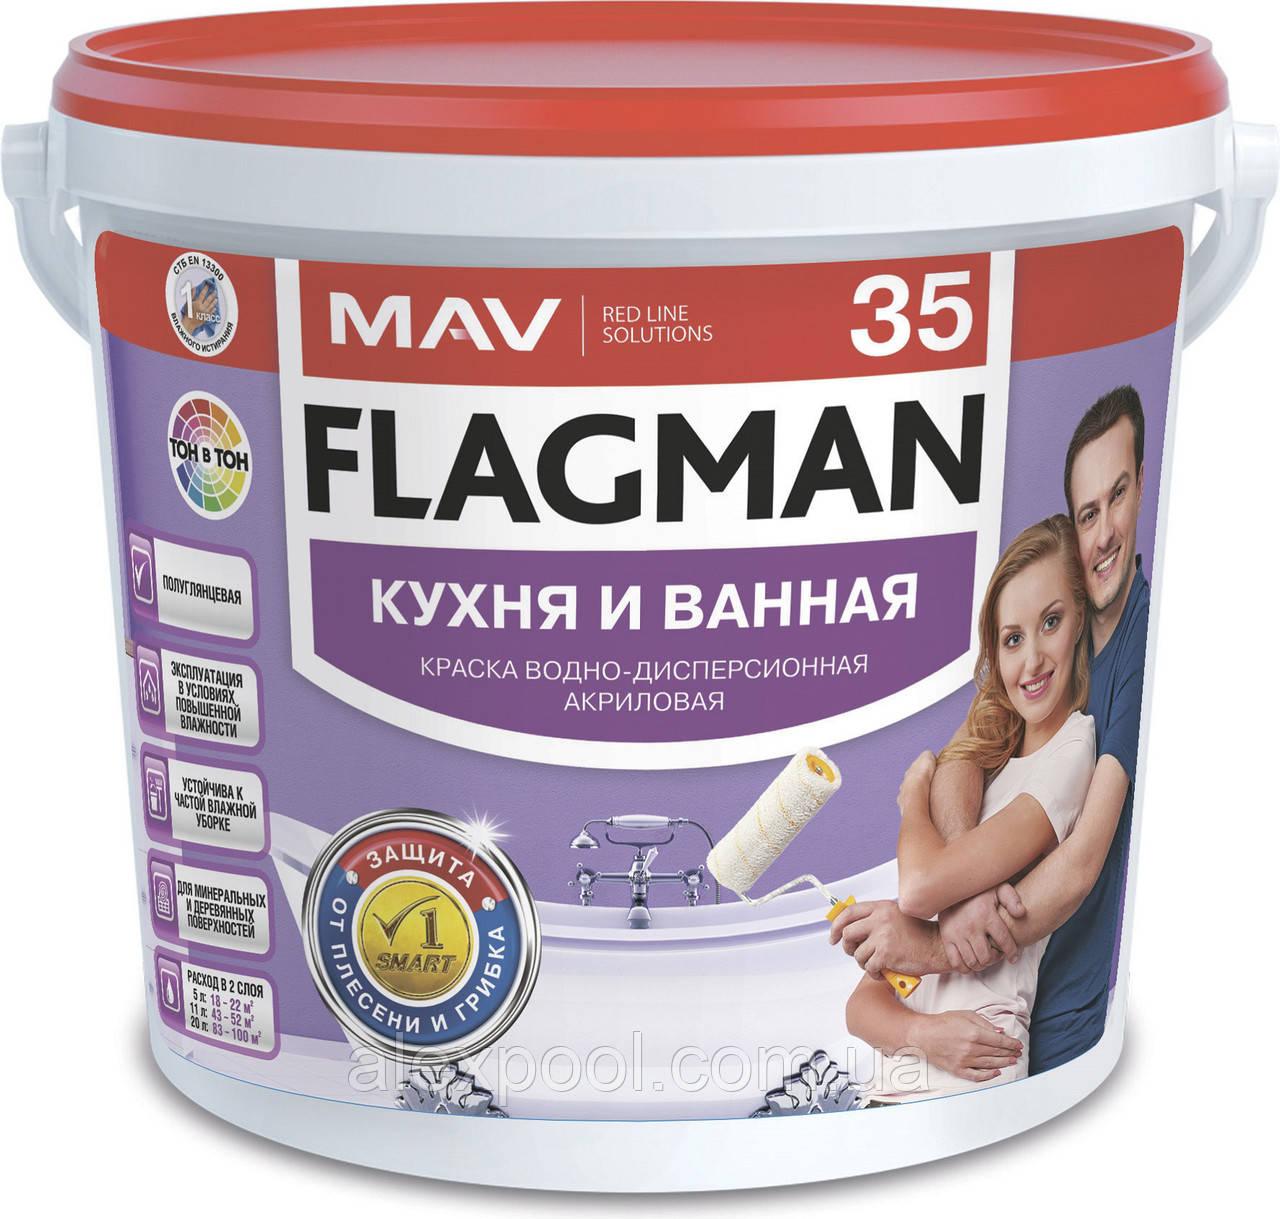 Краска MAV FLAGMAN 35 кухня и ванная  1 литр